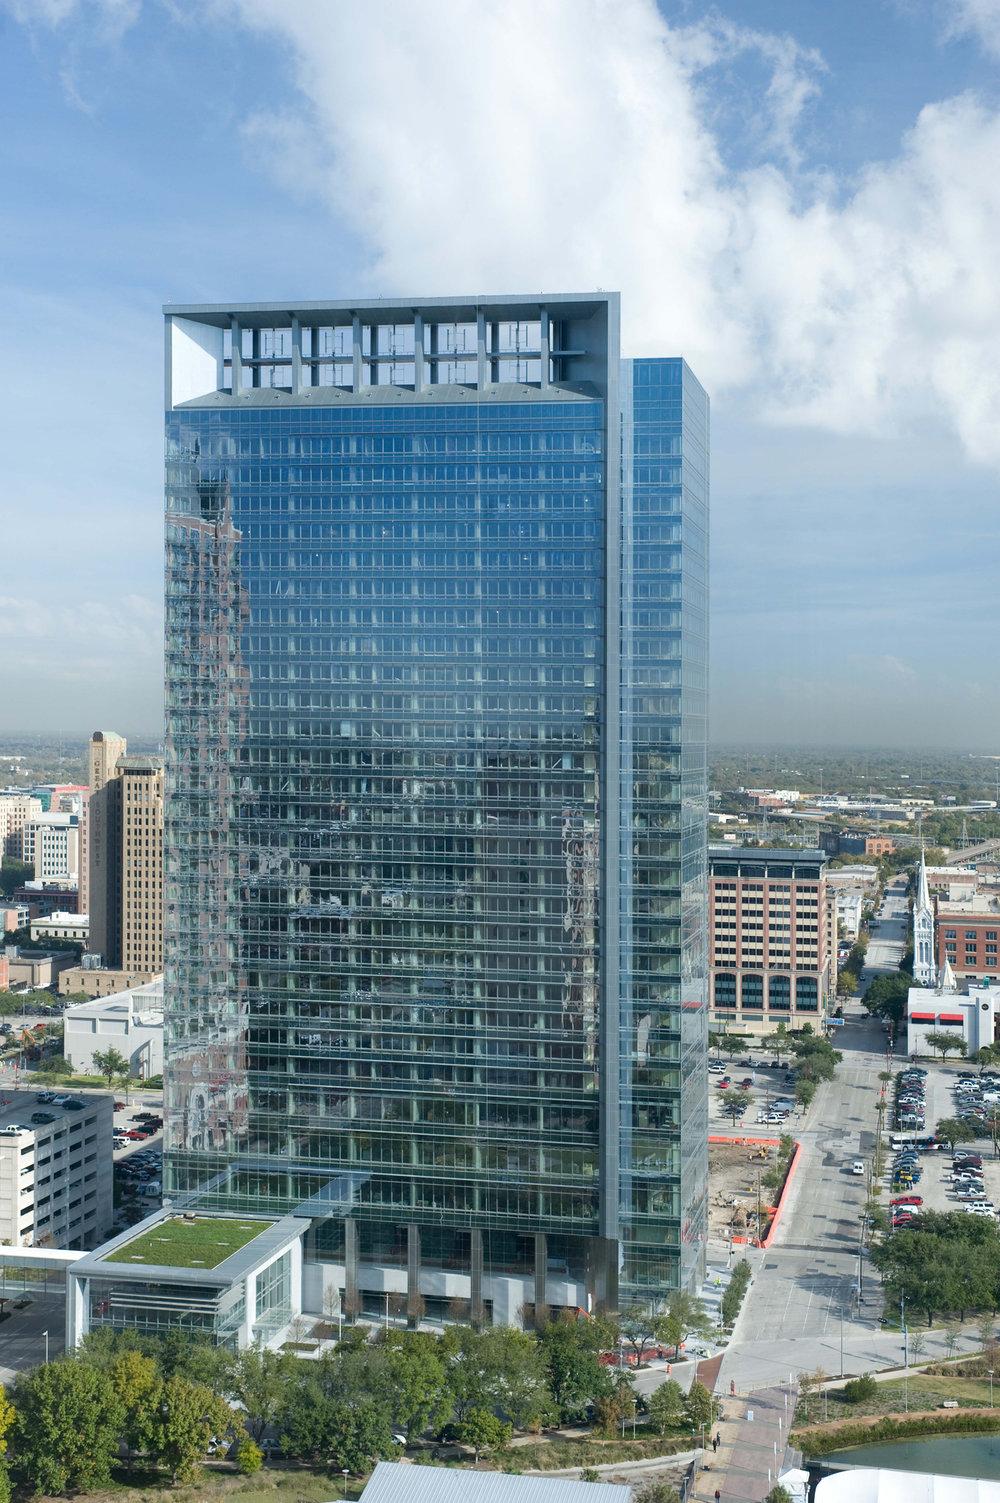 Hess Tower ca. 2011. (Photo credit: http://www.gilbaneco.com/)